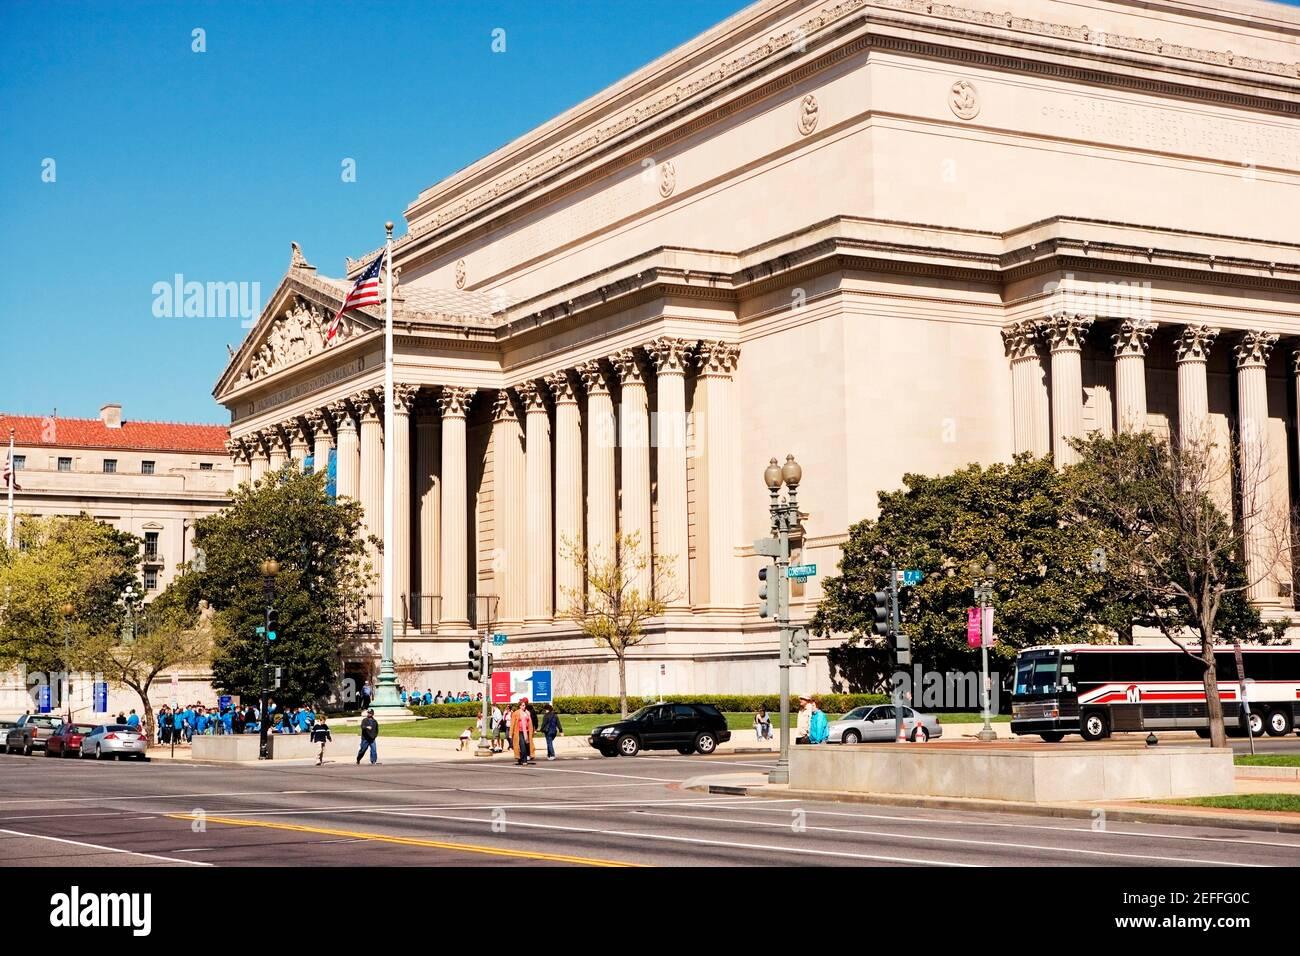 Fassade des National Archives Building, Washington DC, USA, Washington DC, USA Stockfoto